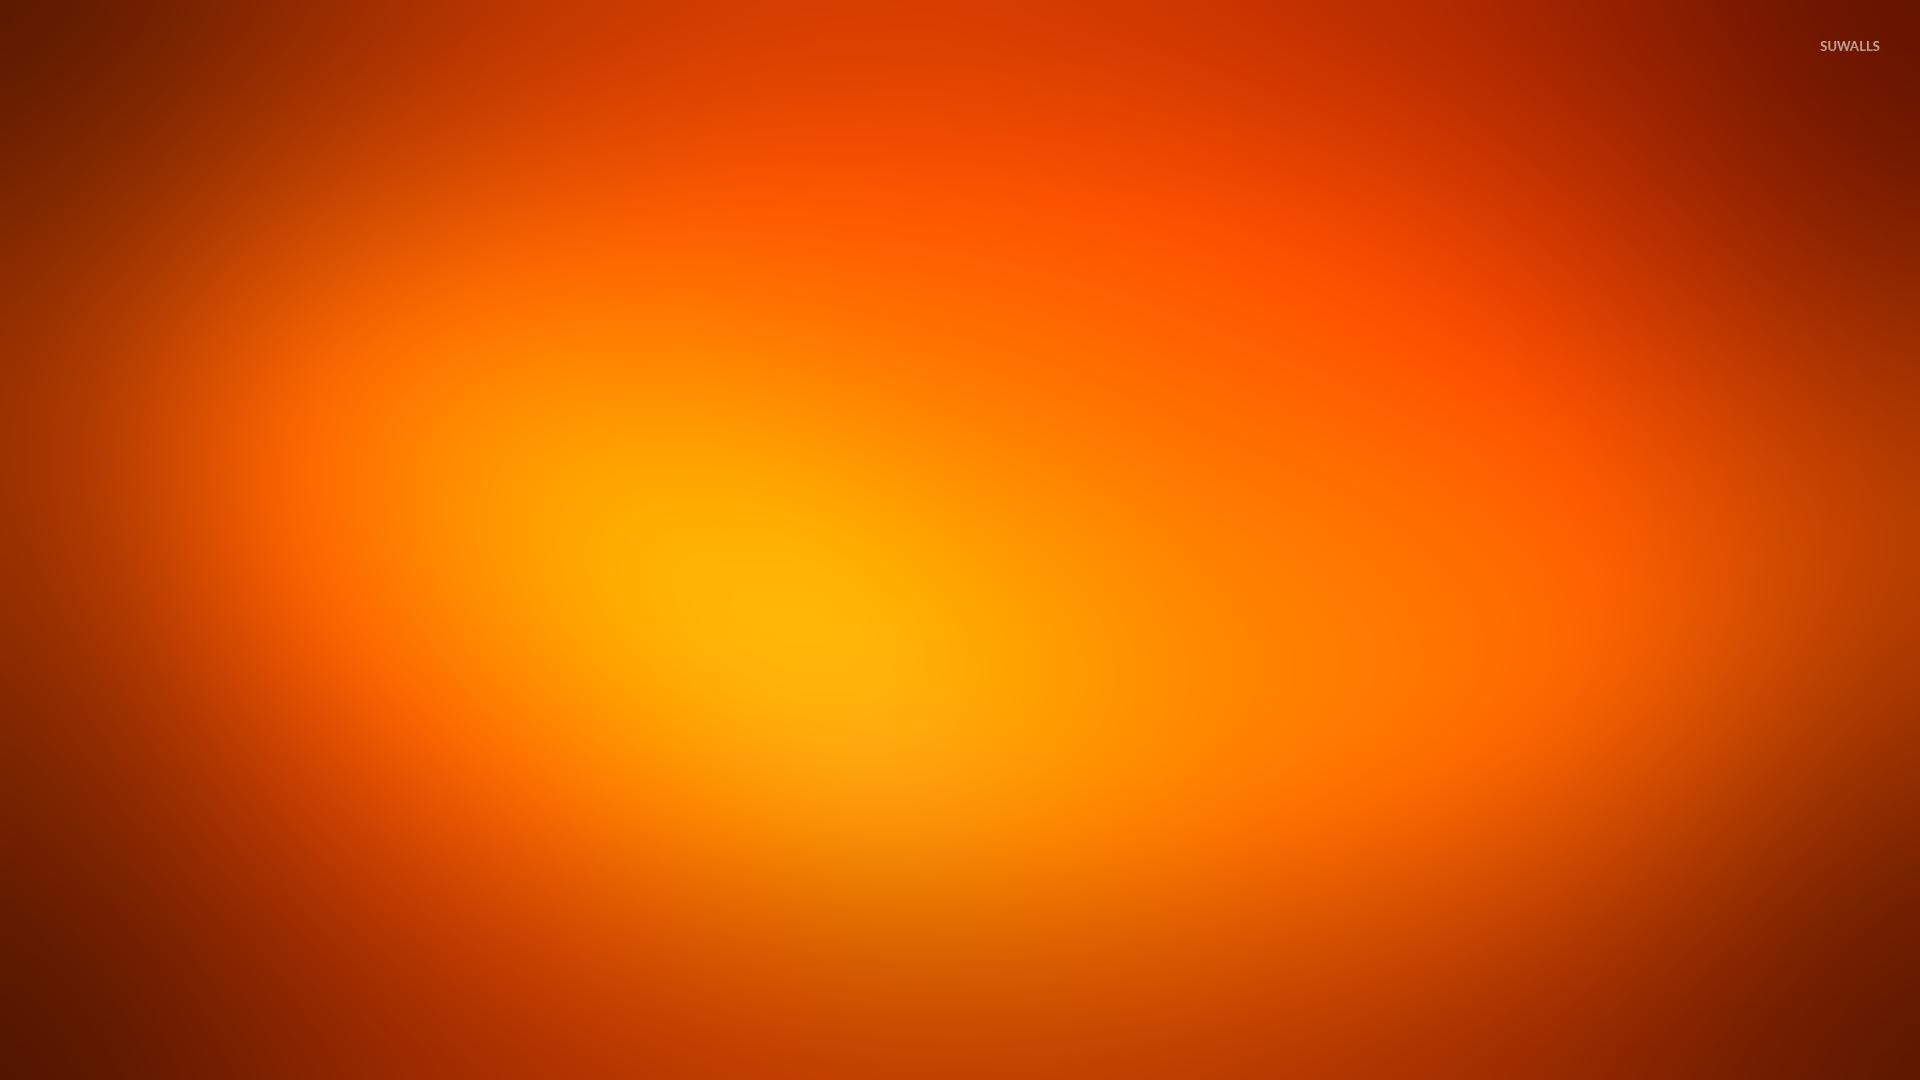 Orange Gradient Wallpaper 1920x1080 Jpg